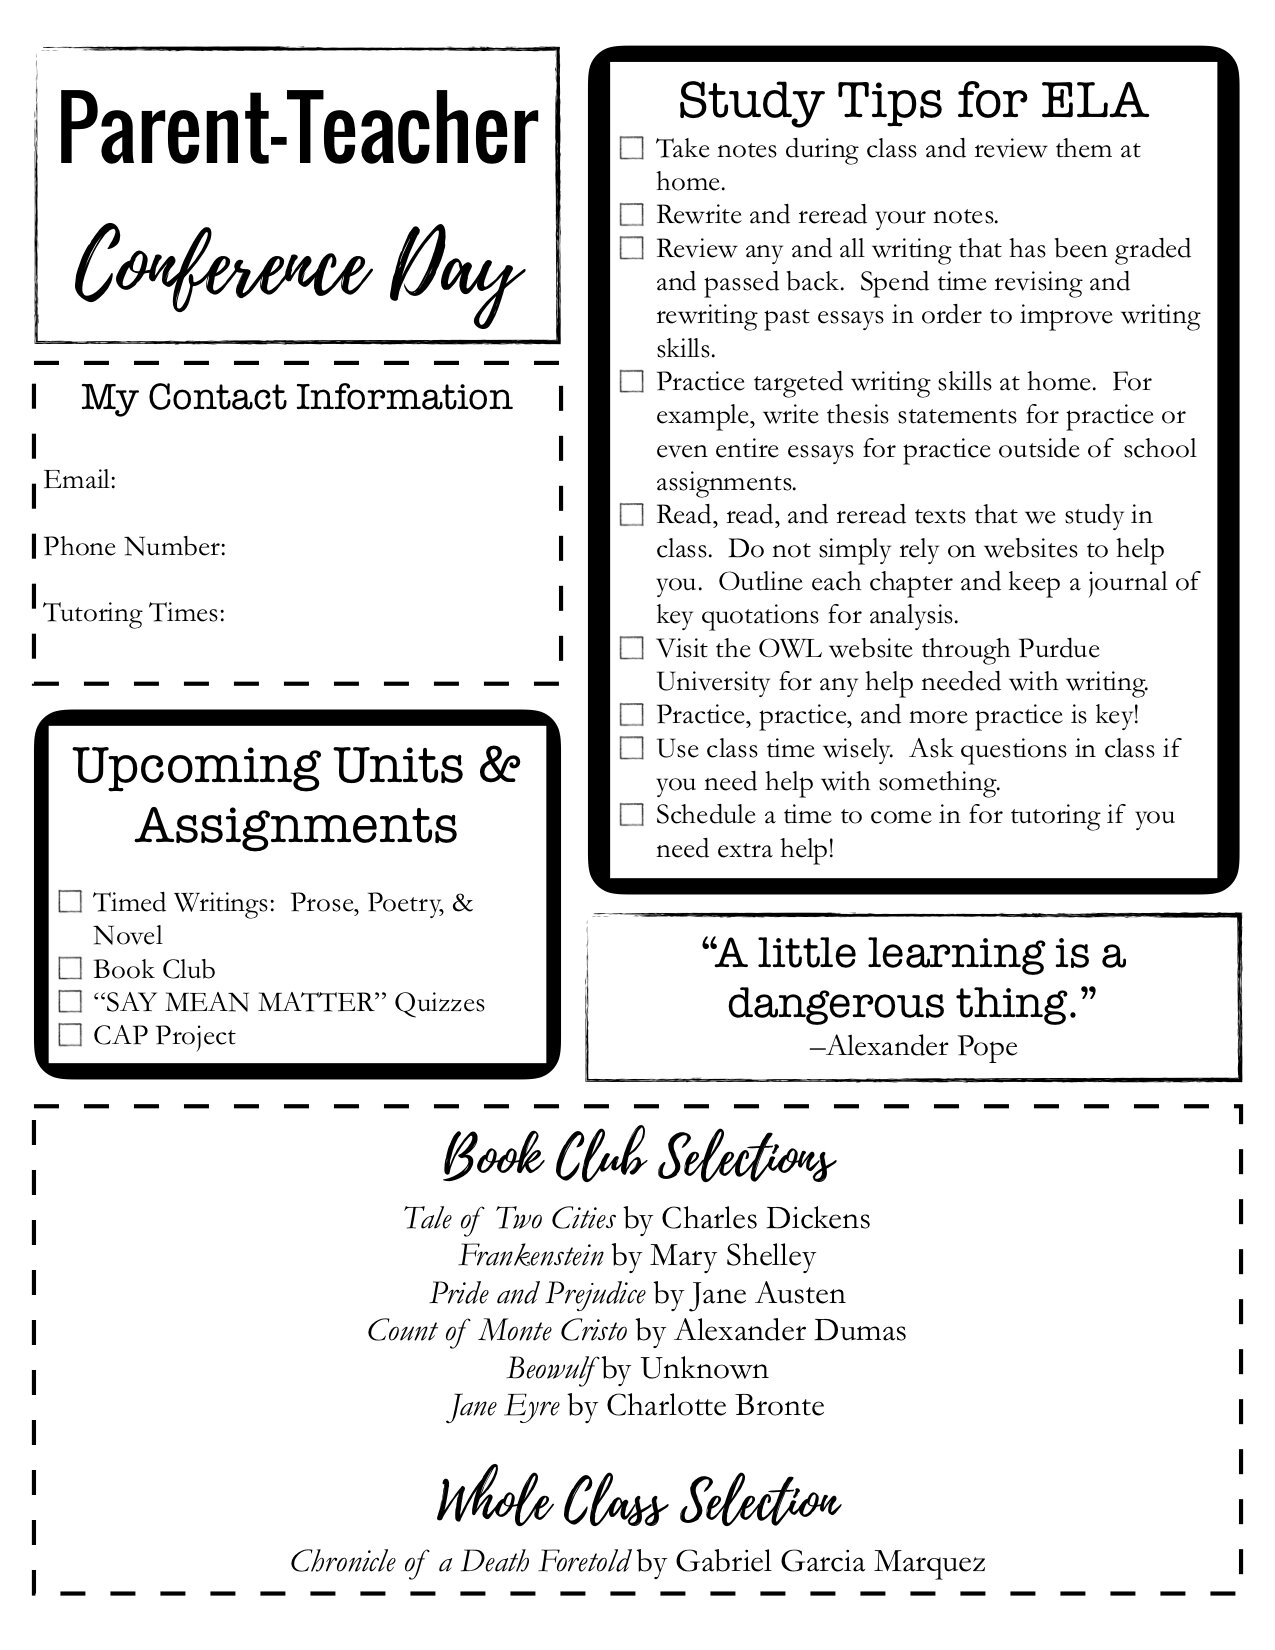 Parent-Teacher Conference Day Handout by Bespoke ELA2.jpg